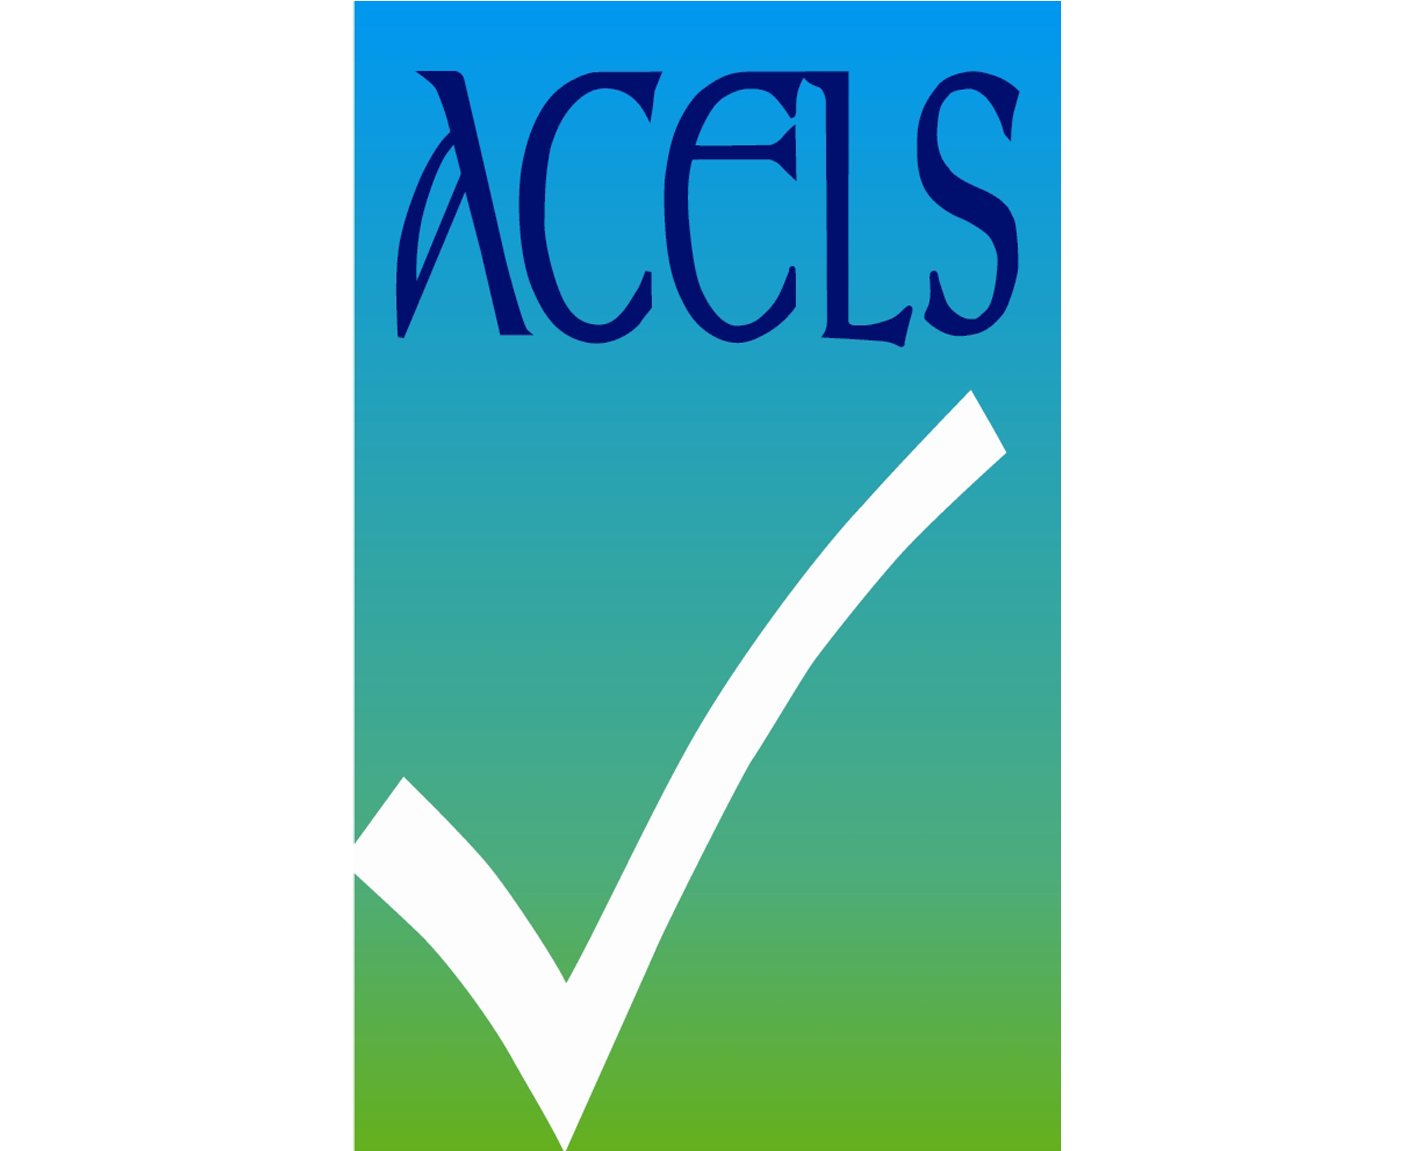 ACELS ATC Accreditation